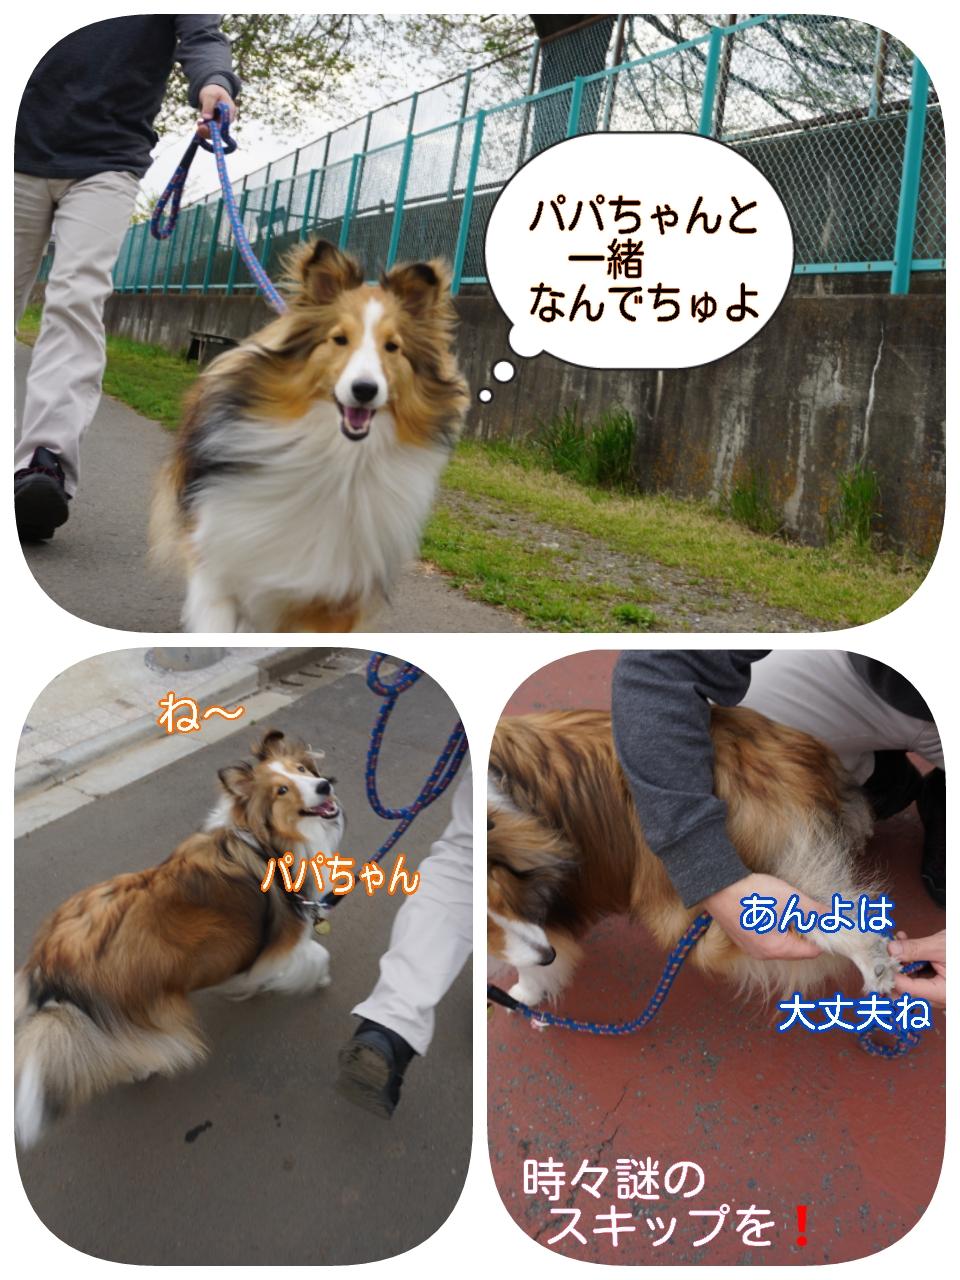 2015-04-19-19-29-56_deco.jpg